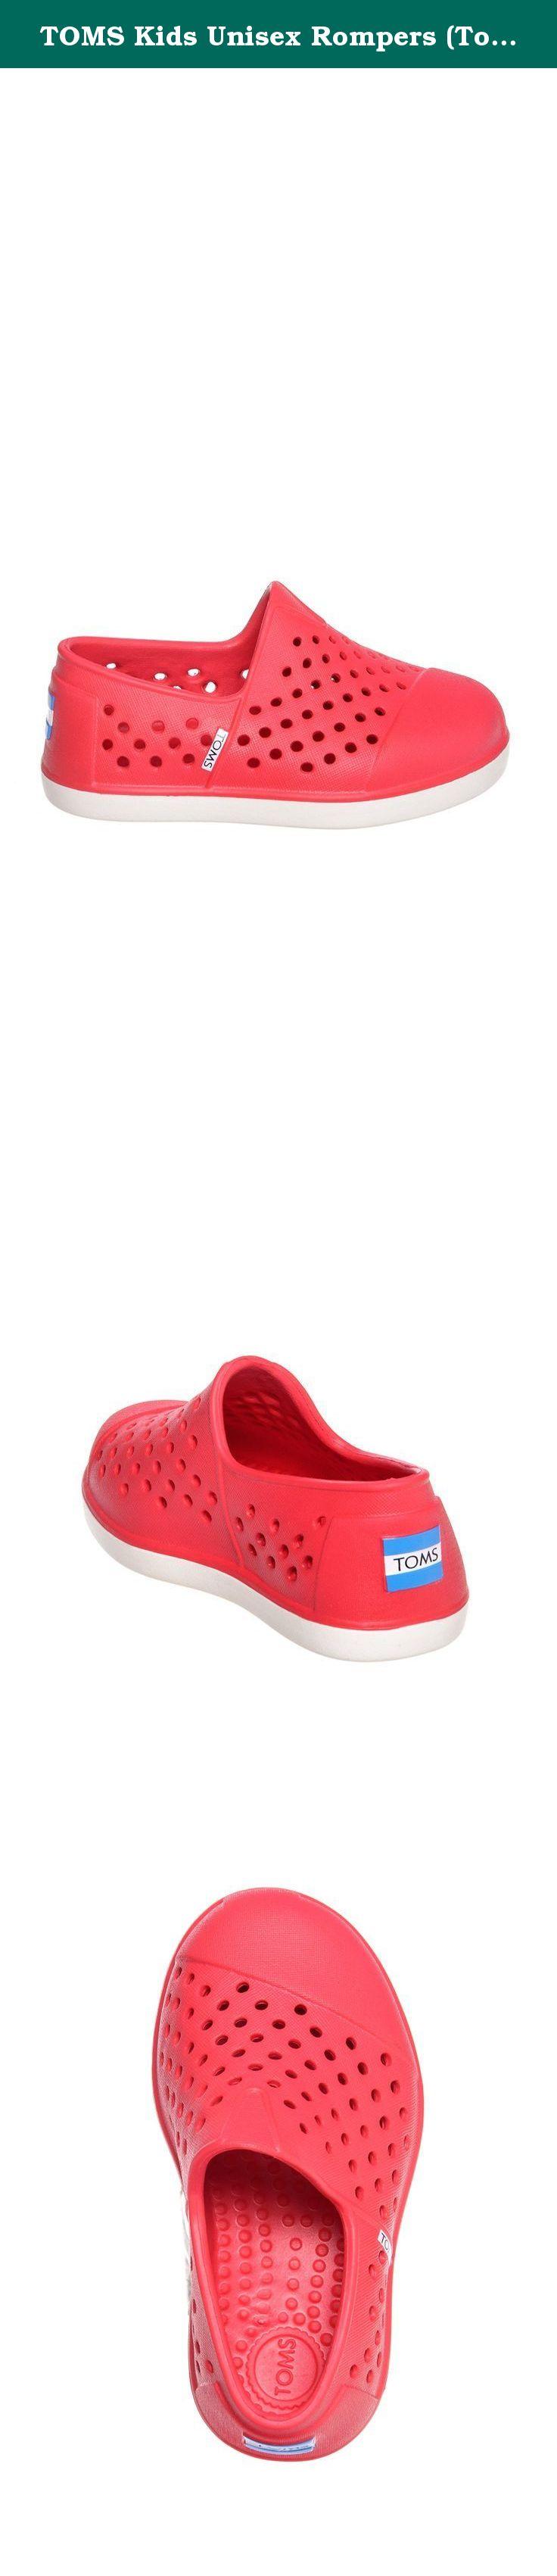 ec32e8dcfd6 TOMS Kids Unisex Rompers (Toddler Little Kid) Red Sneaker 8 Toddler M.  Lightweight